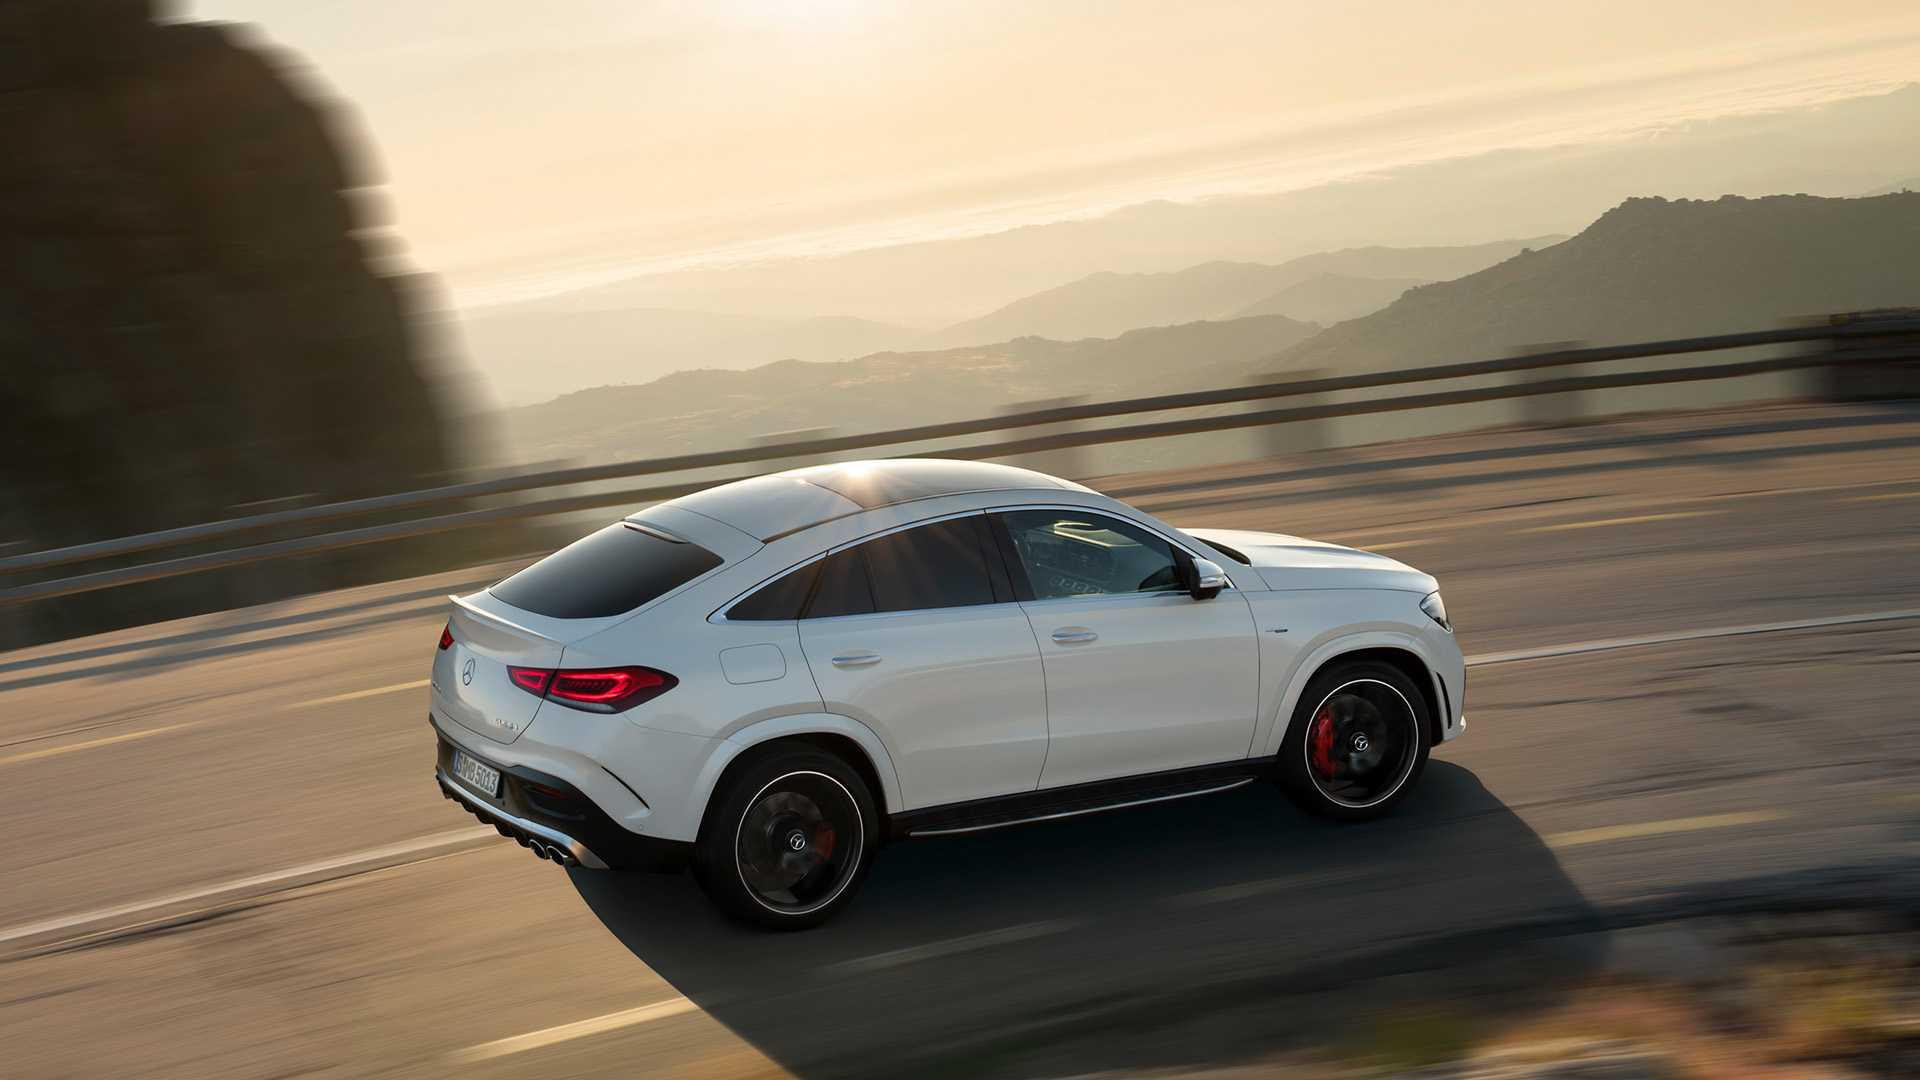 2021 Mercedes-AMG GLE 53 Coupe 4MATIC+ (Color: Designo Diamond White Bright) Top Wallpapers (8)